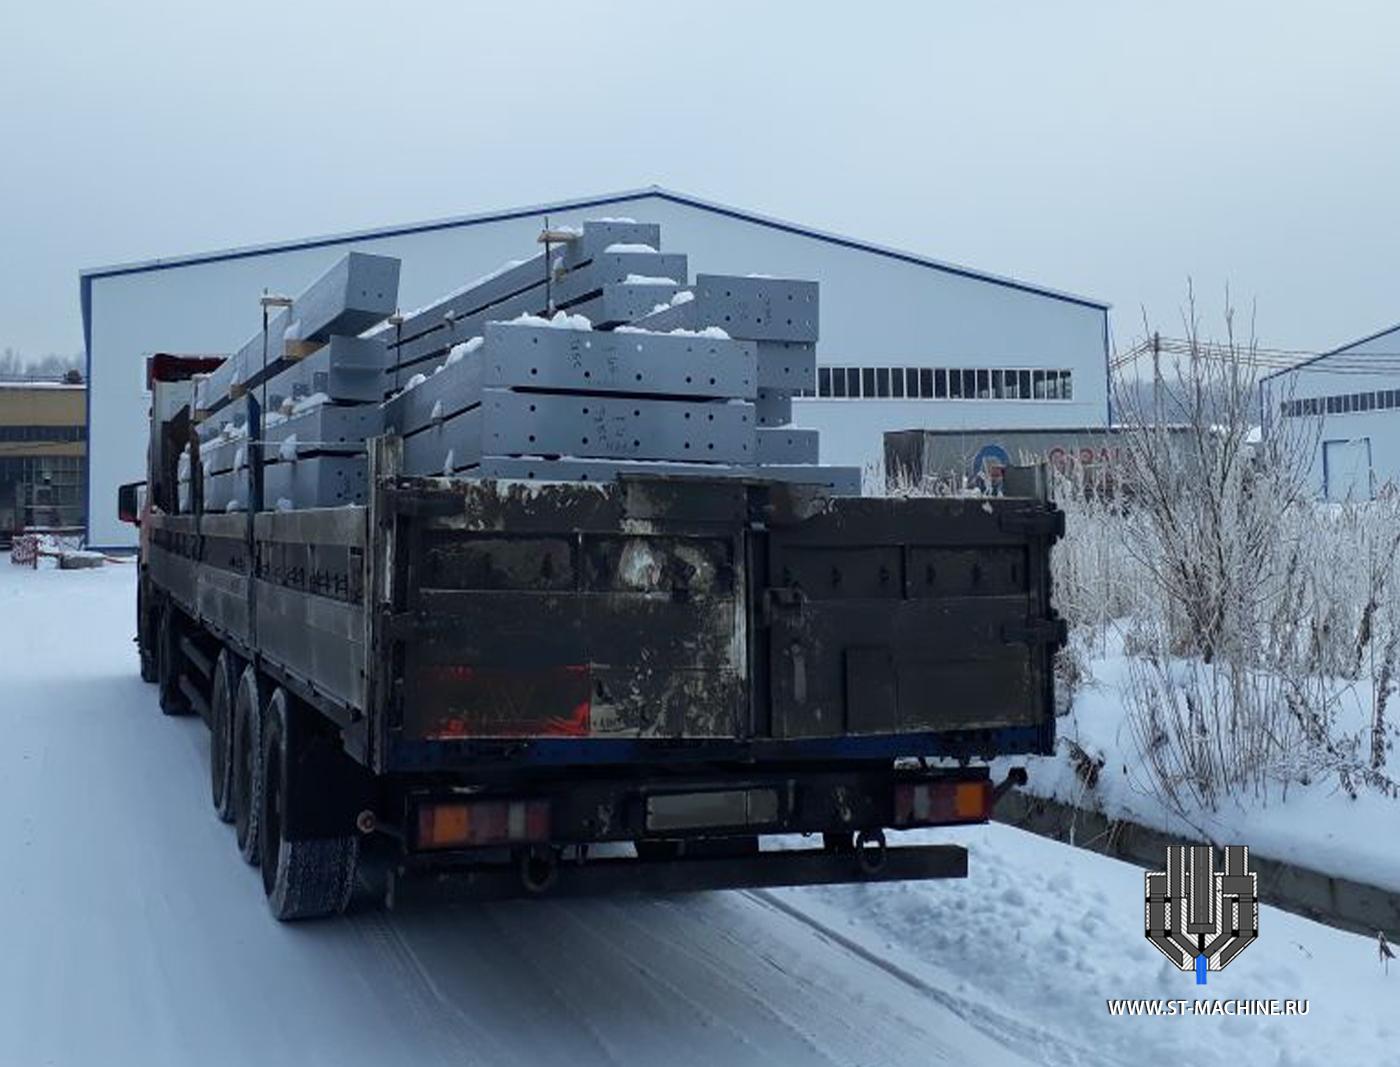 izgotovlenie-metallokonstrukzii-st-machine.ru.jpg